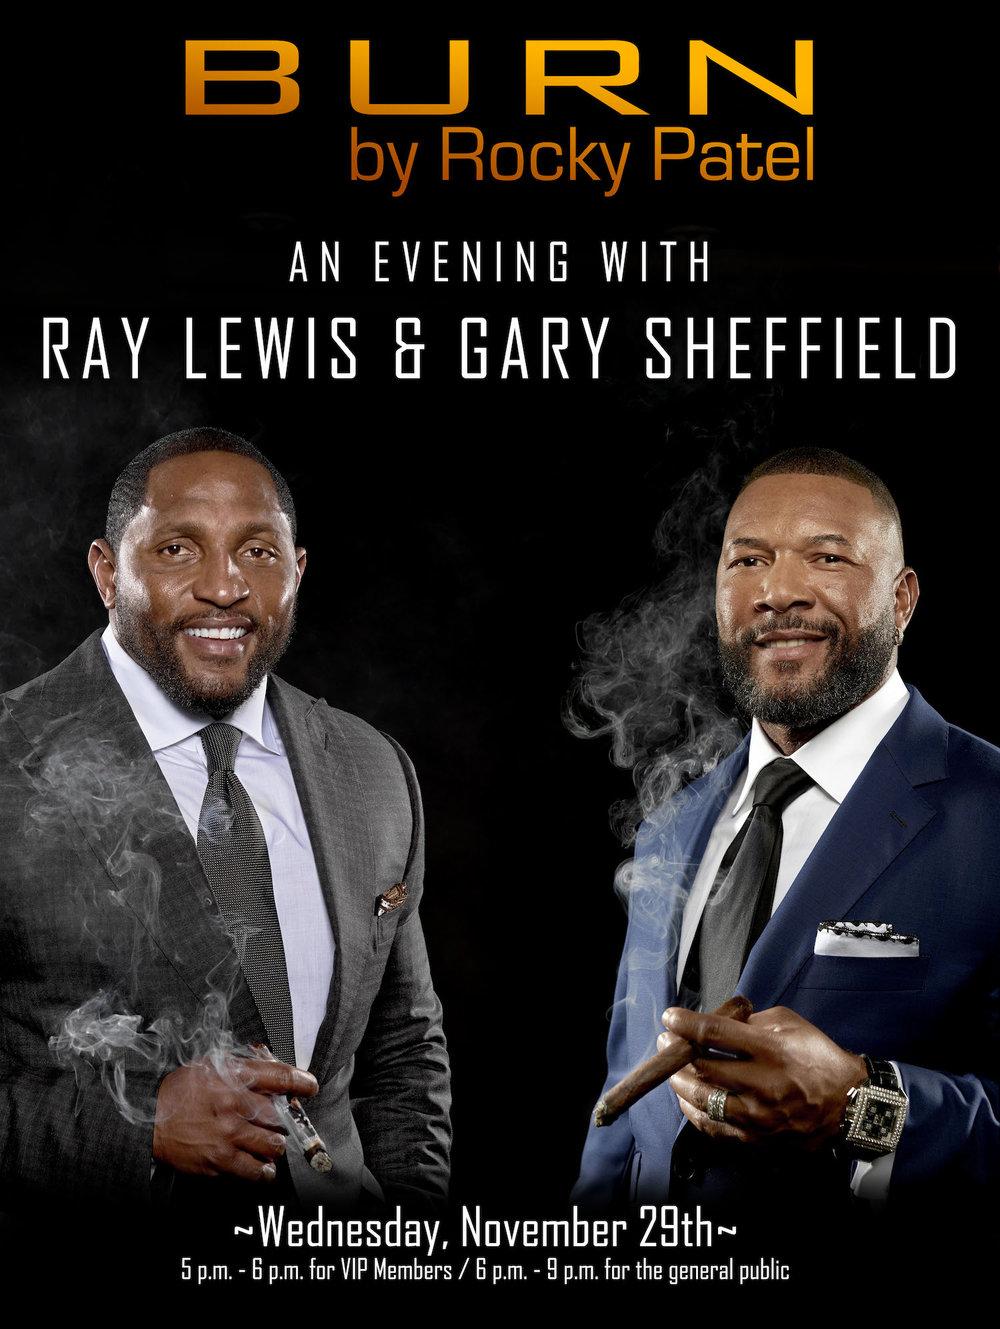 Burn Ray Lewis Gary Sheffield Event